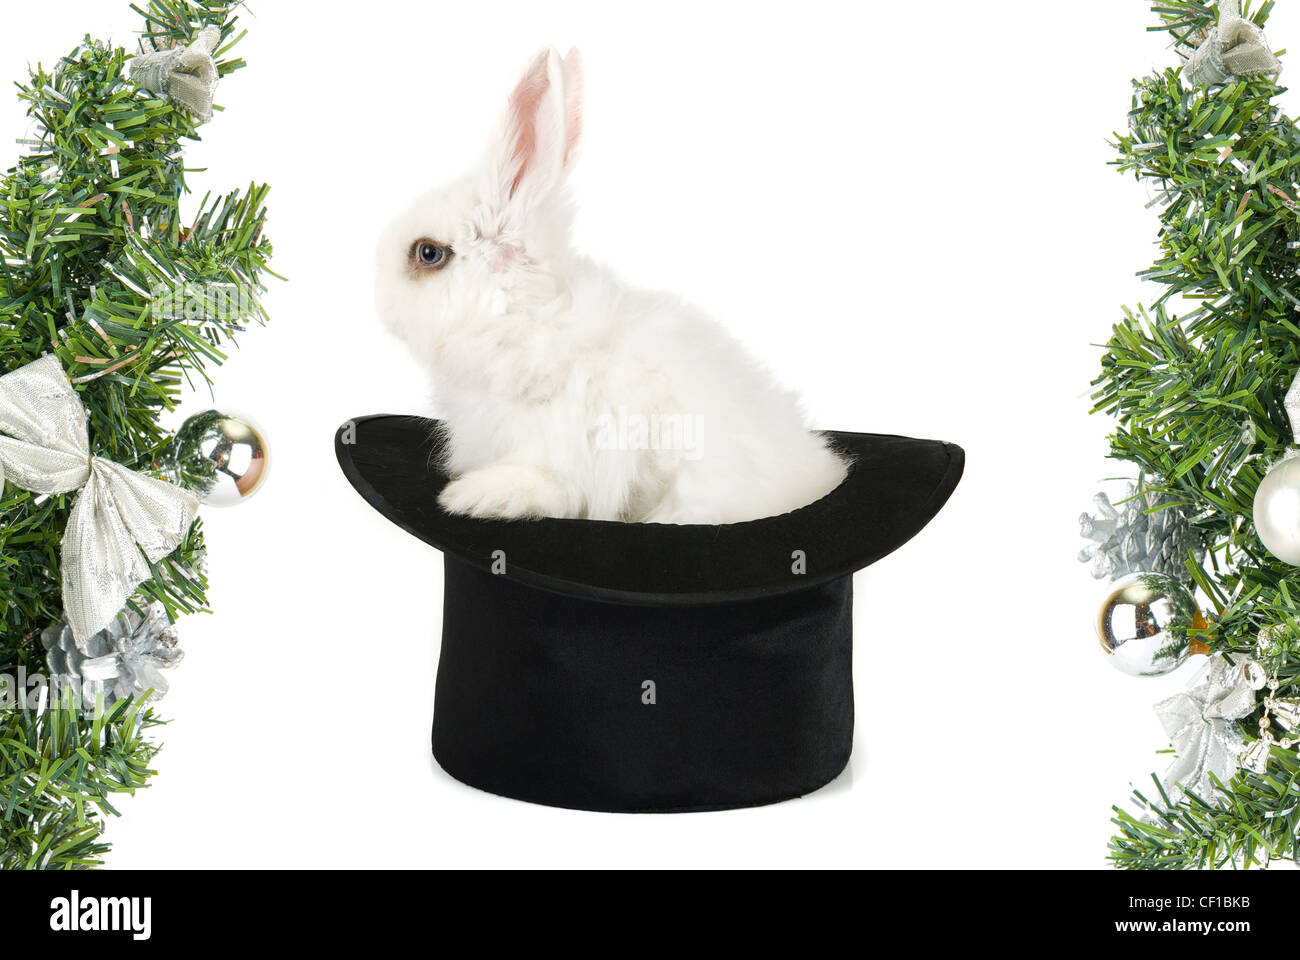 White Rabbit Black Hat Symbol Stock Photos White Rabbit Black Hat